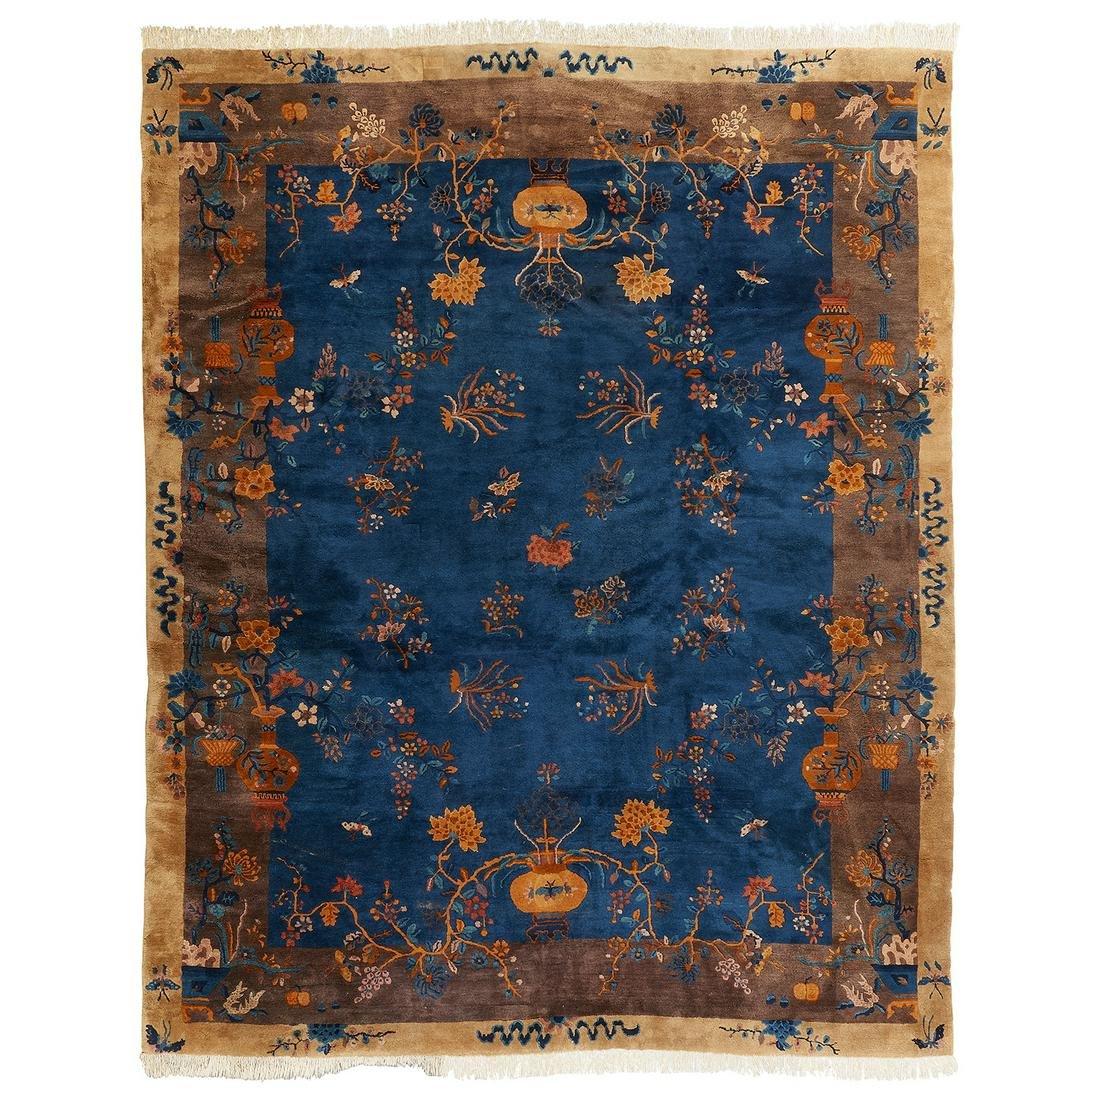 "Art Deco rug 11' 4 1/4"" x 9' 1/4"""